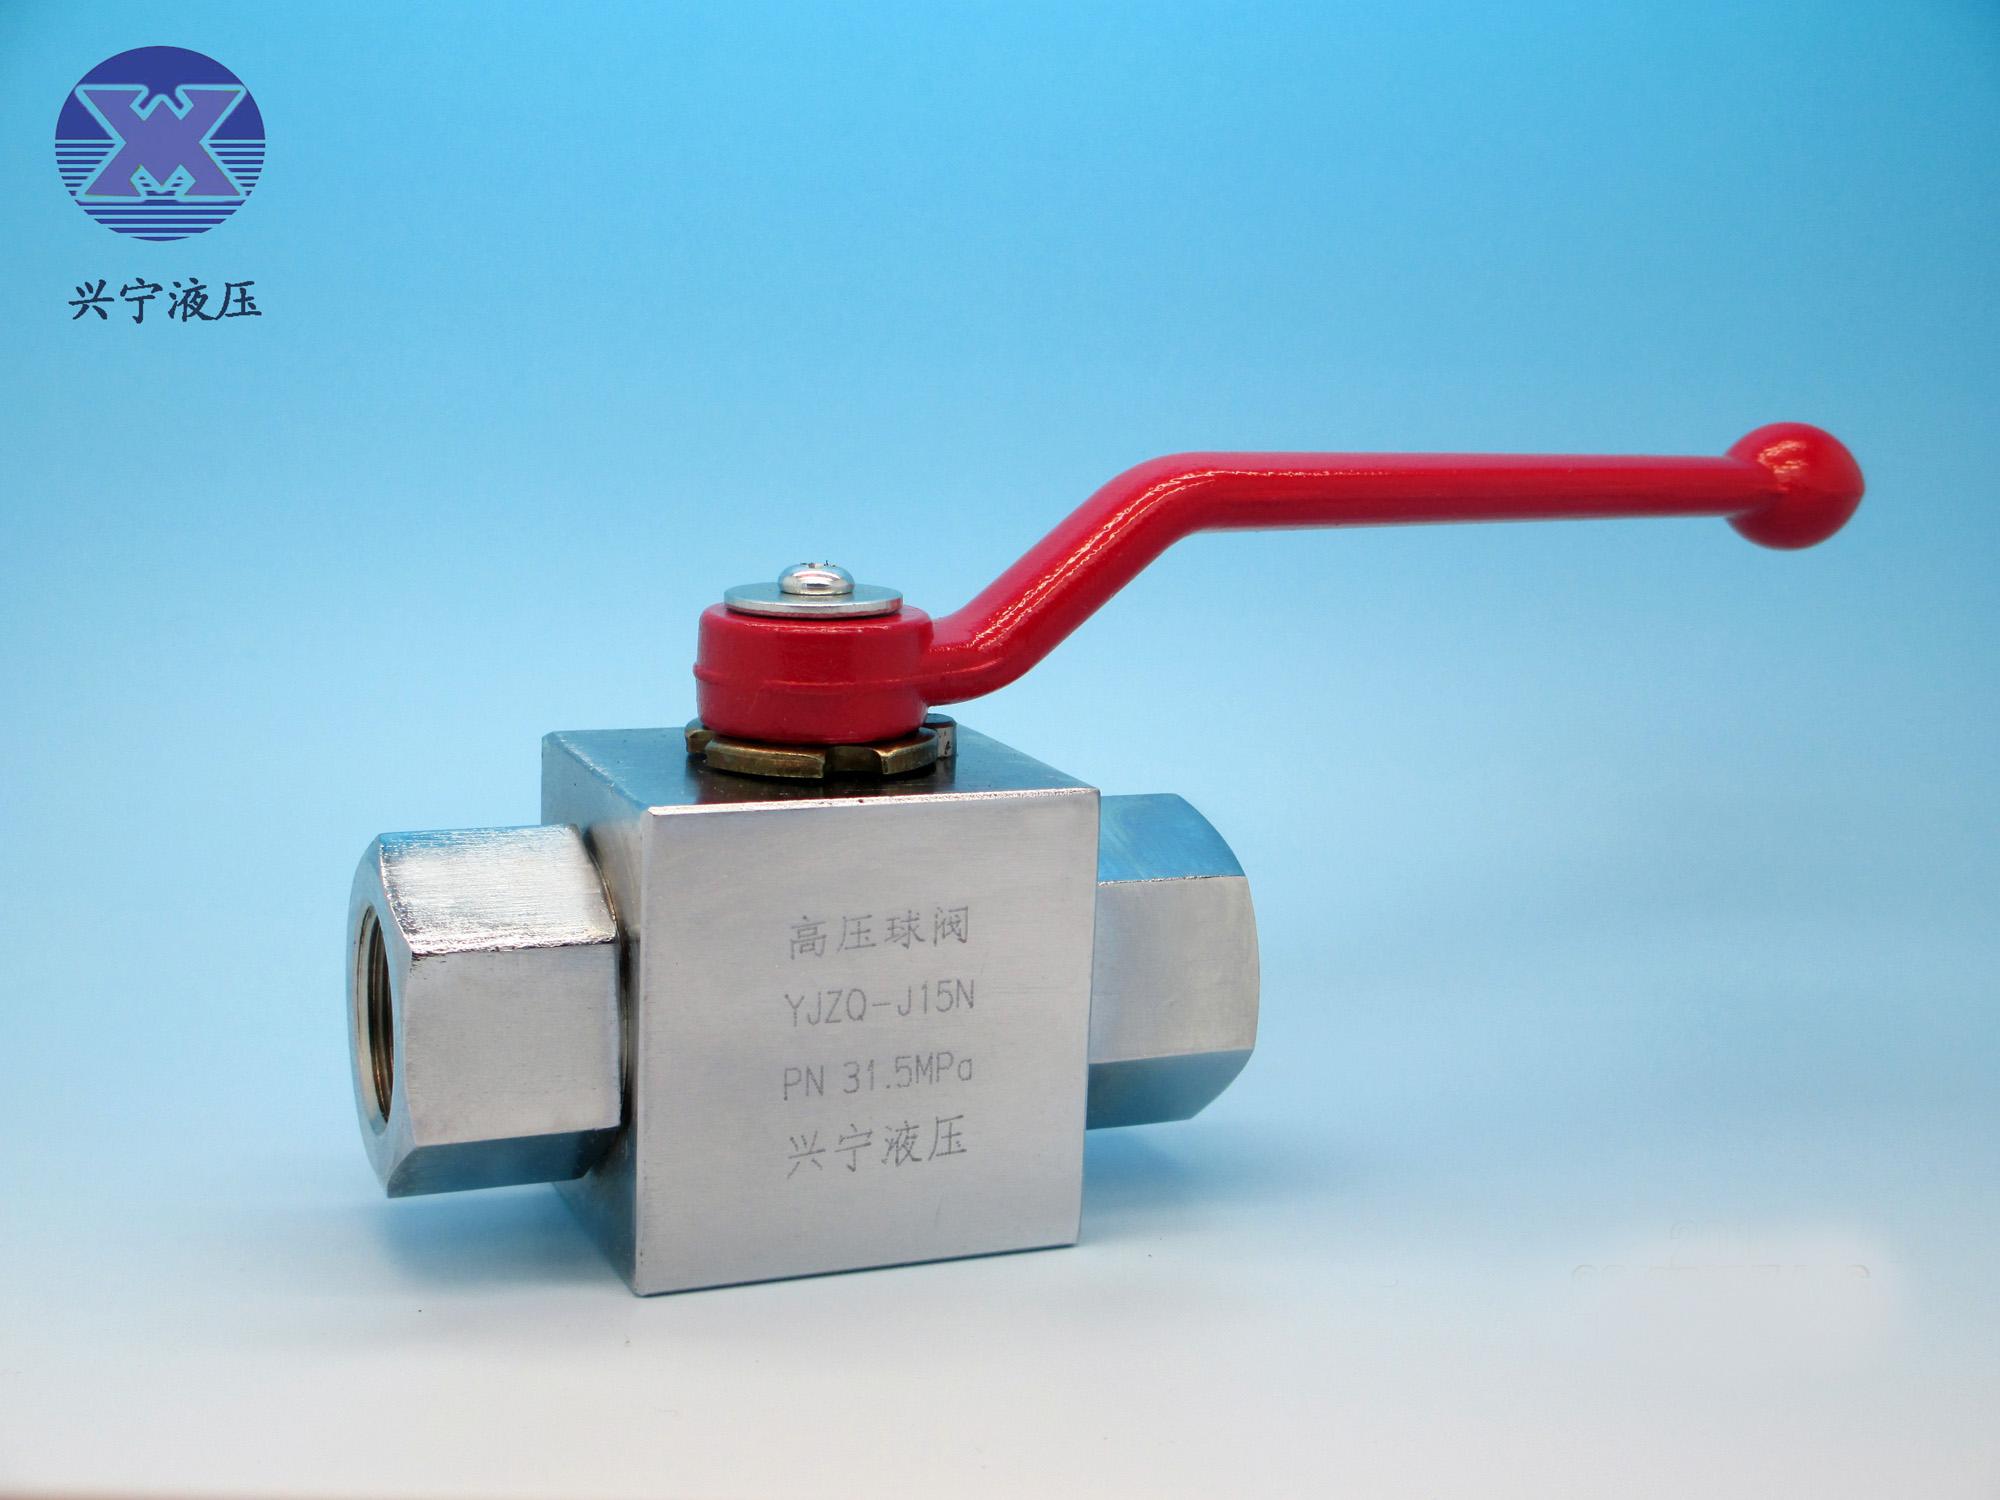 YJZQ型高压液压球阀YJZQ-J15N